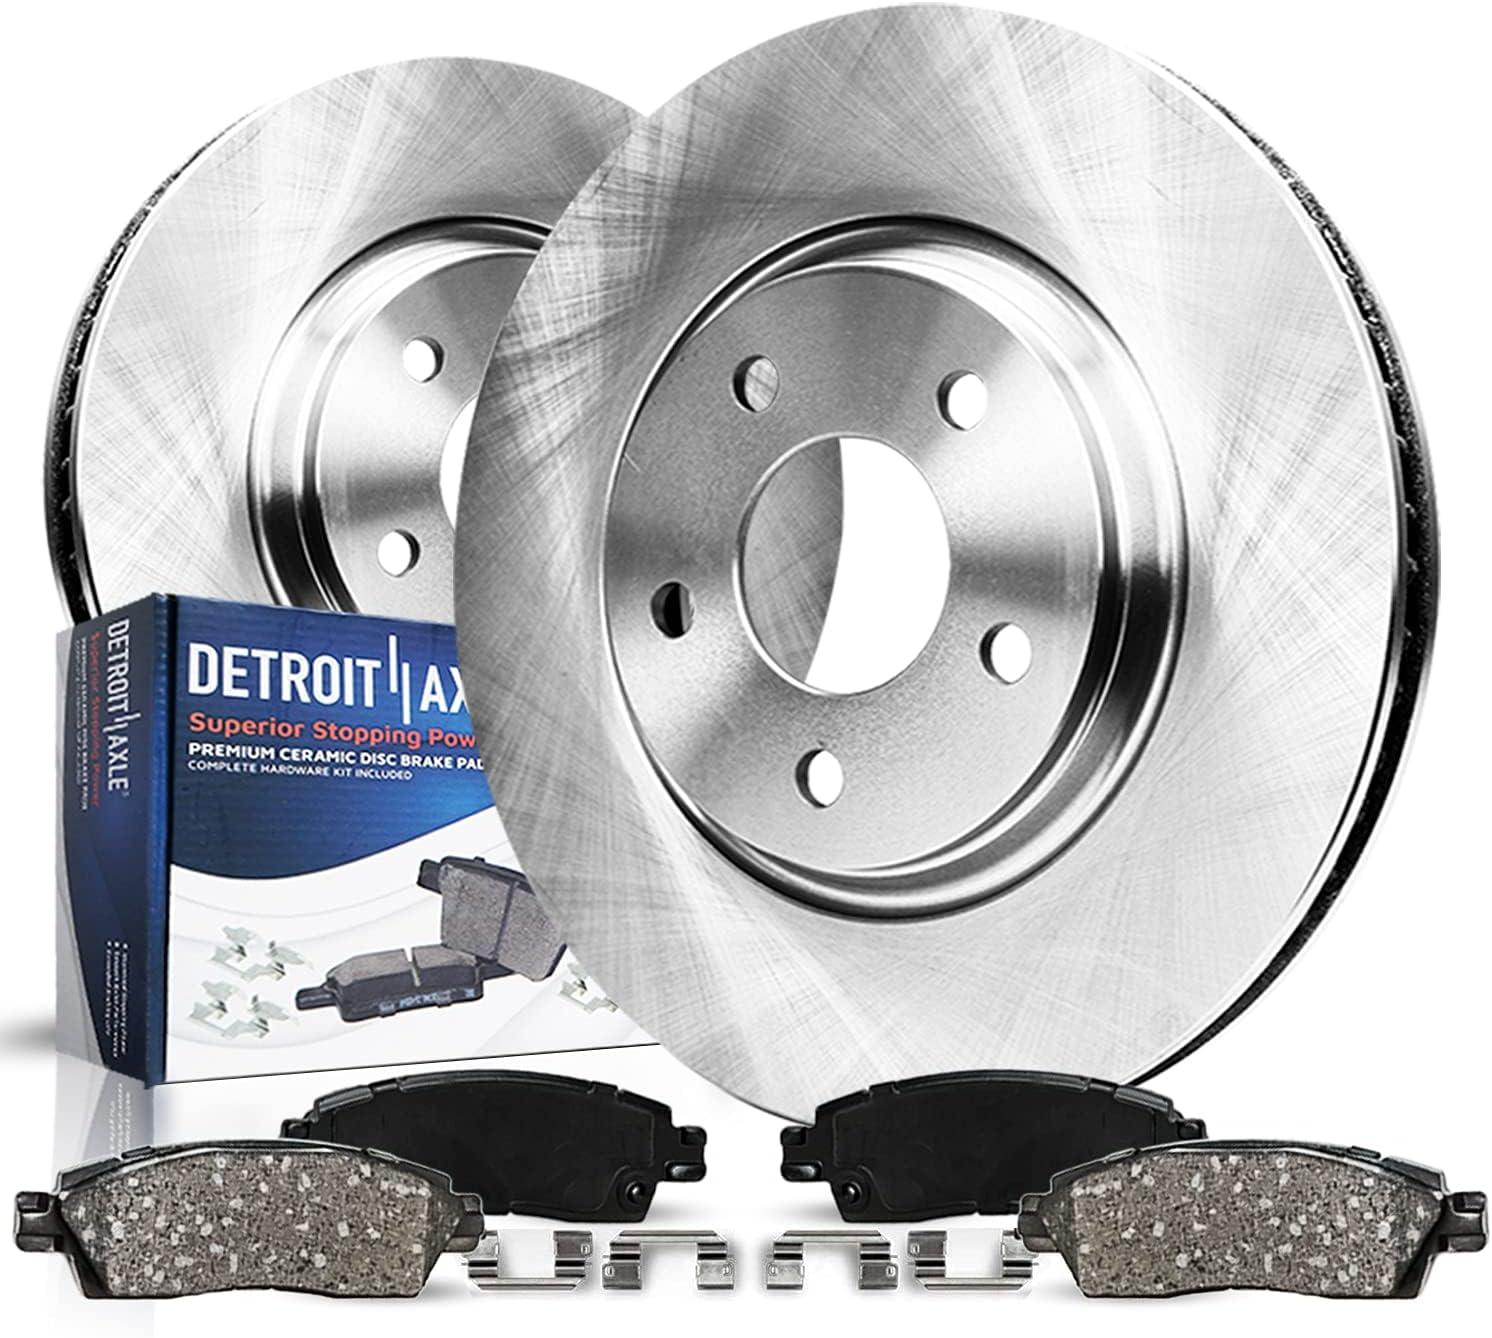 Detroit Axle - Front [並行輸入品] Brake Kit w Clips 5☆好評 Ceramic Rotors Pads Har